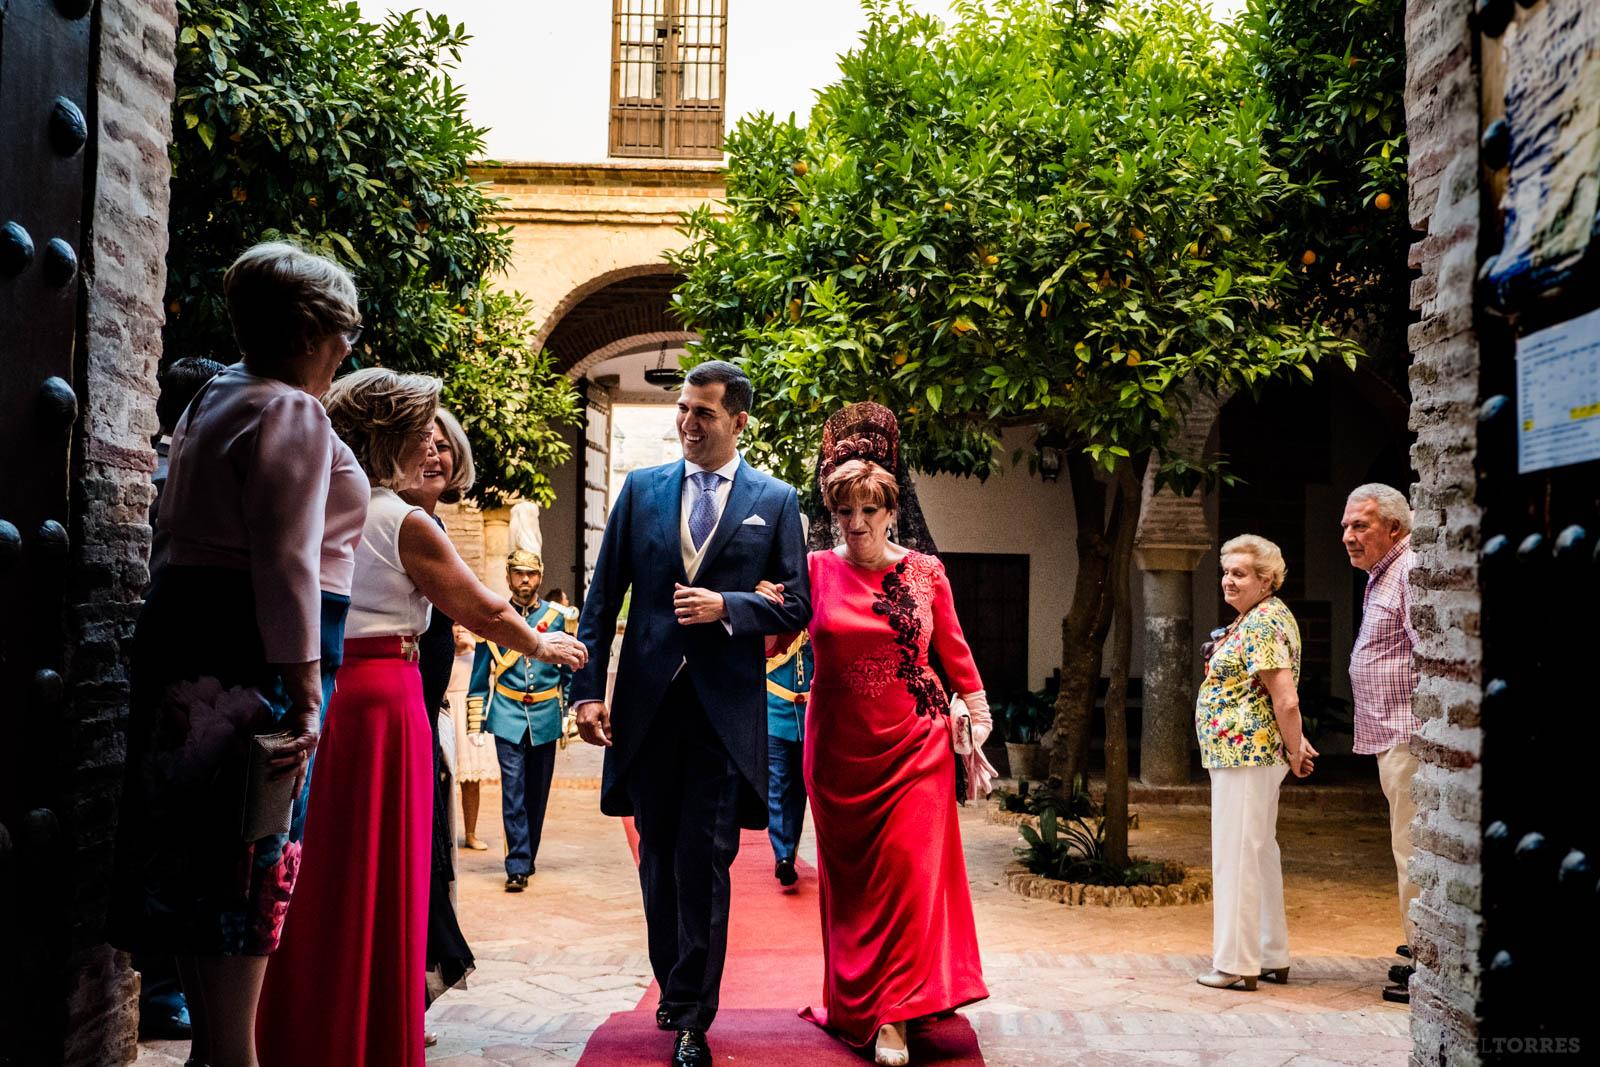 Rafael+Torres+fotografo+bodas+sevilla+madrid+barcelona+wedding+photographer+bodas+diferentes+bodaensevilla+molinillos+fotografo+hacienda+oran+alfonso+wedding+photographer-21.jpg